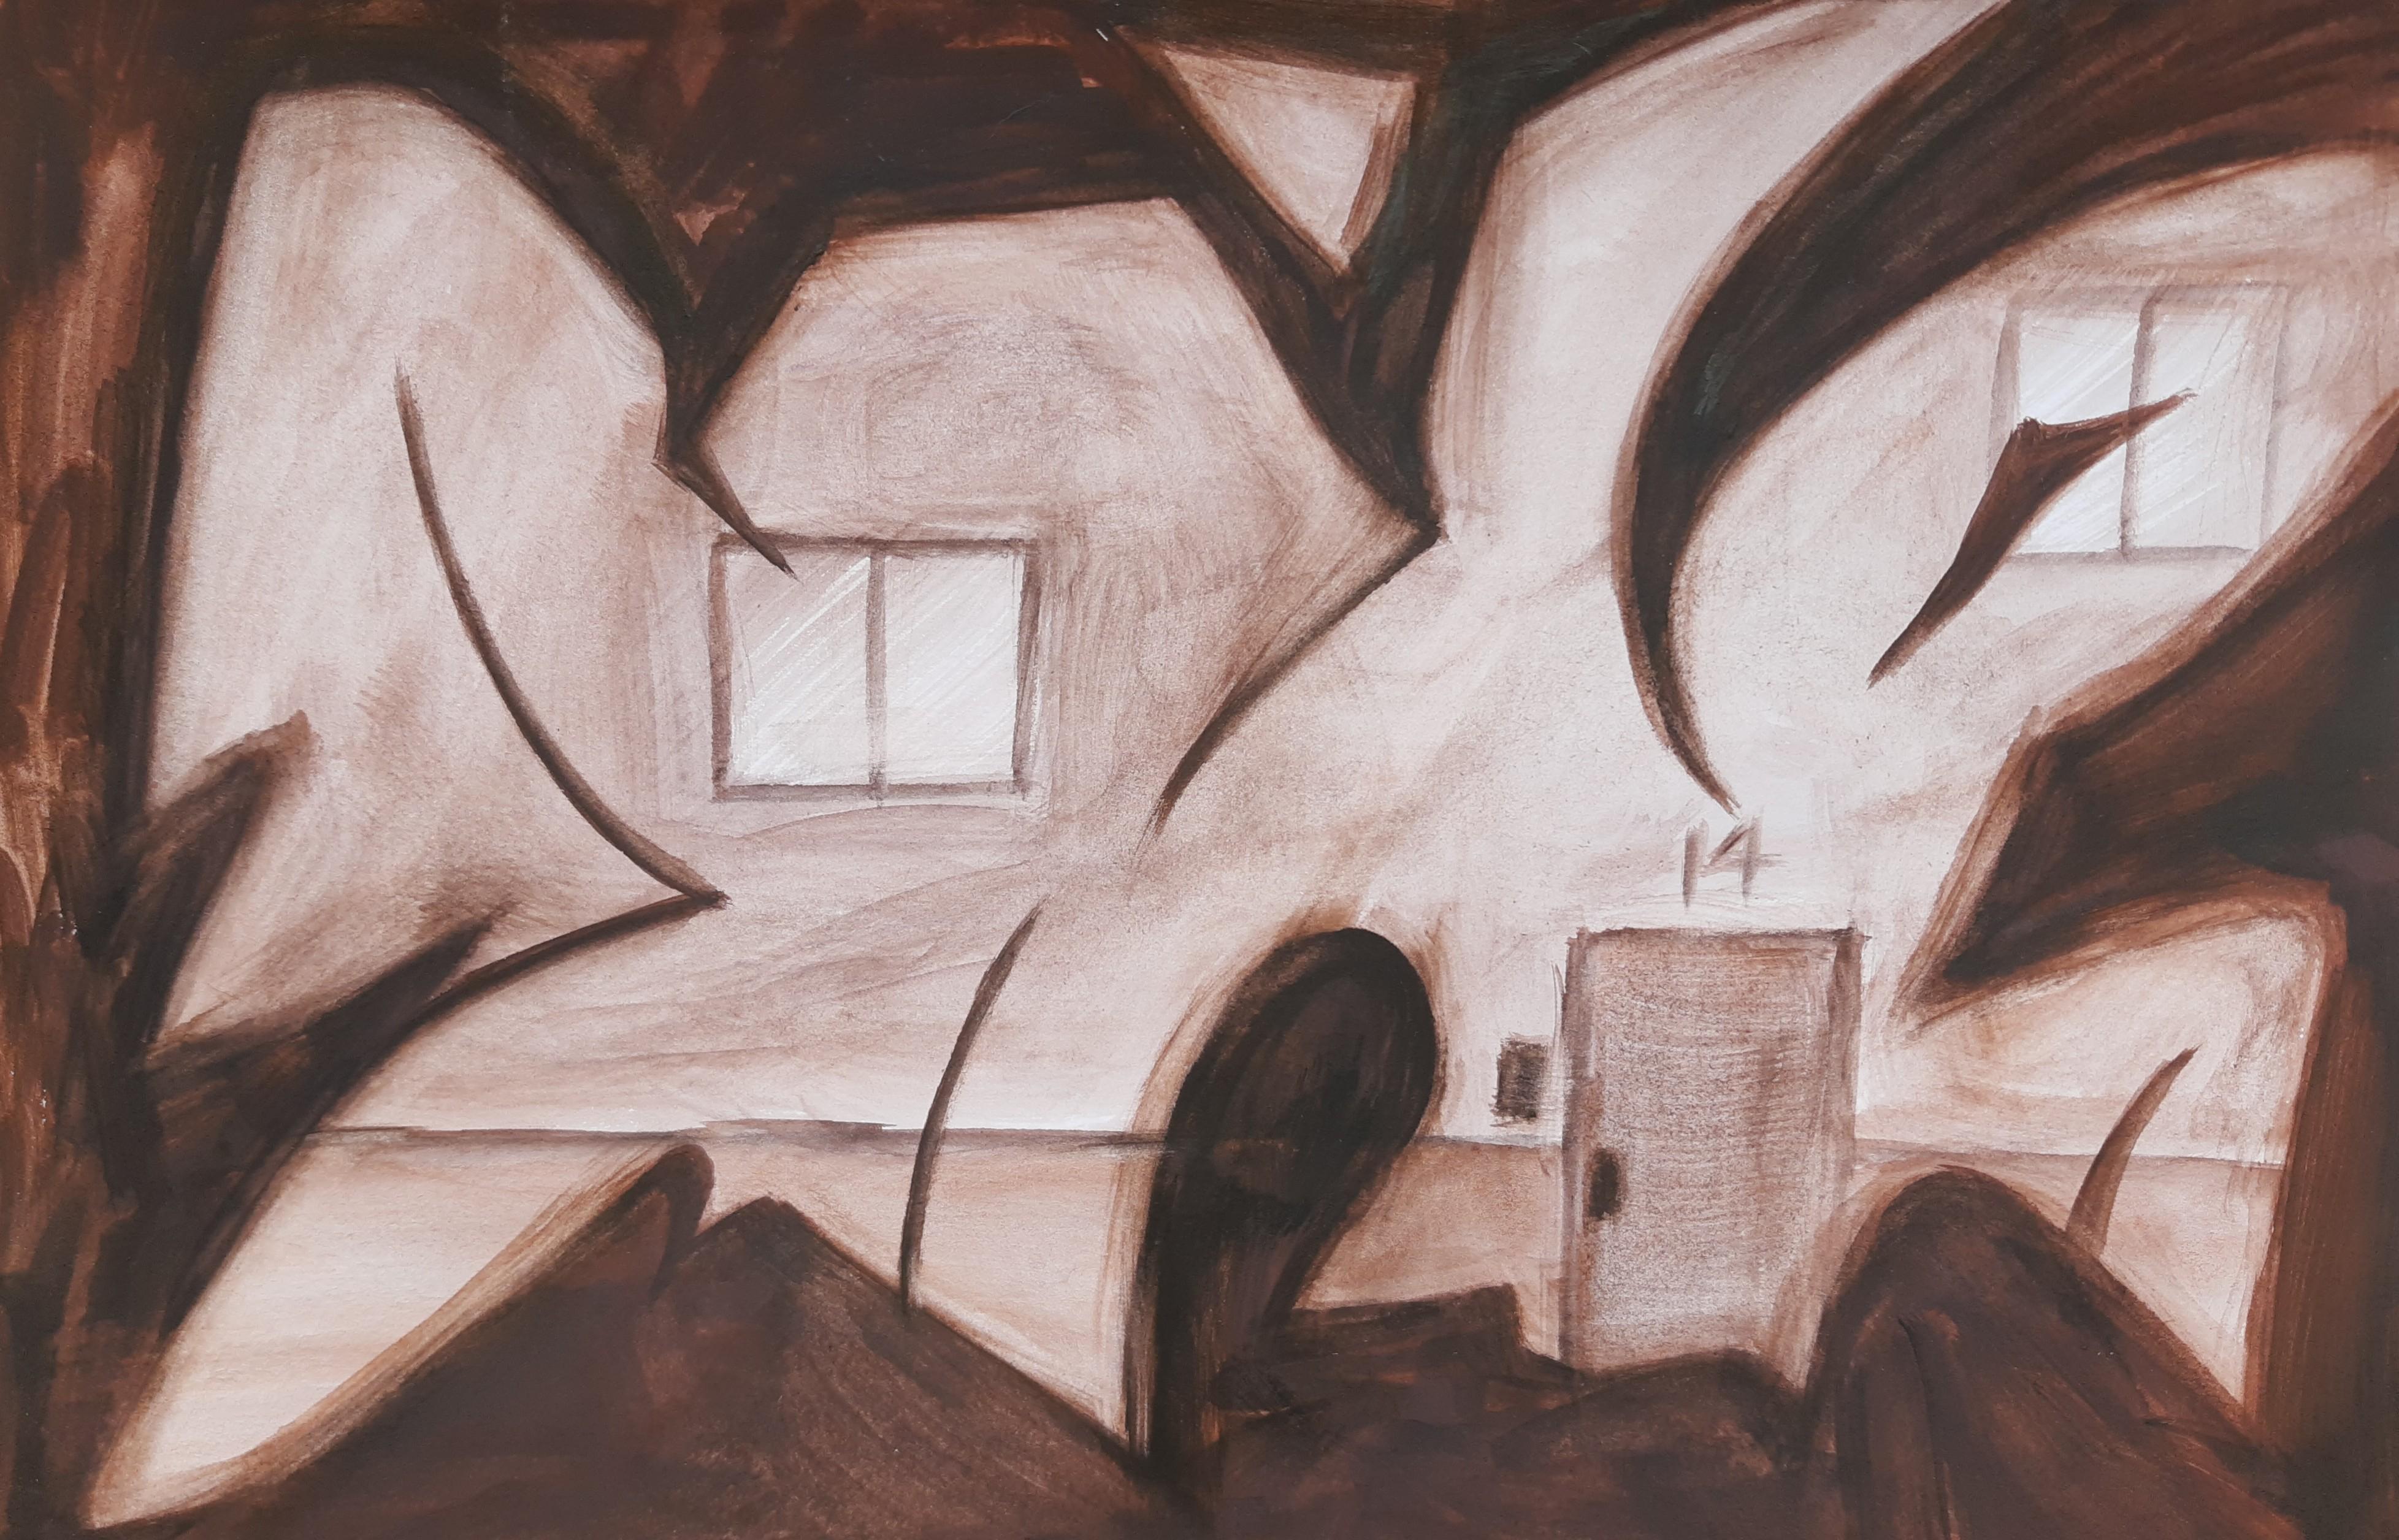 Graffiti house, gouache on paper, 2020